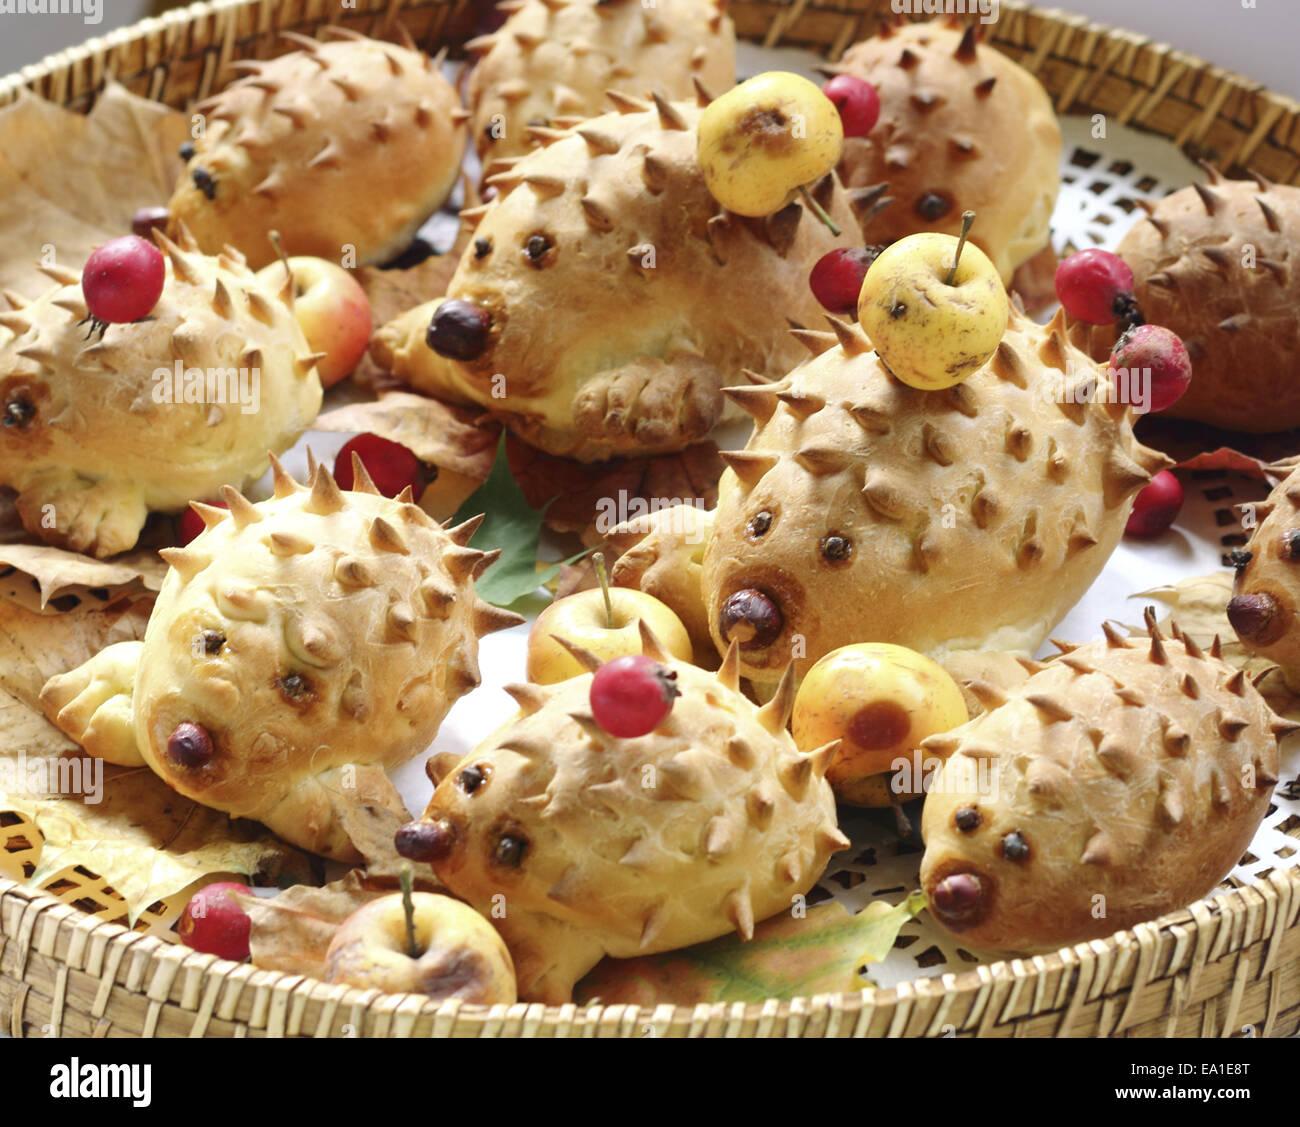 Cookies hedgehogs - Stock Image